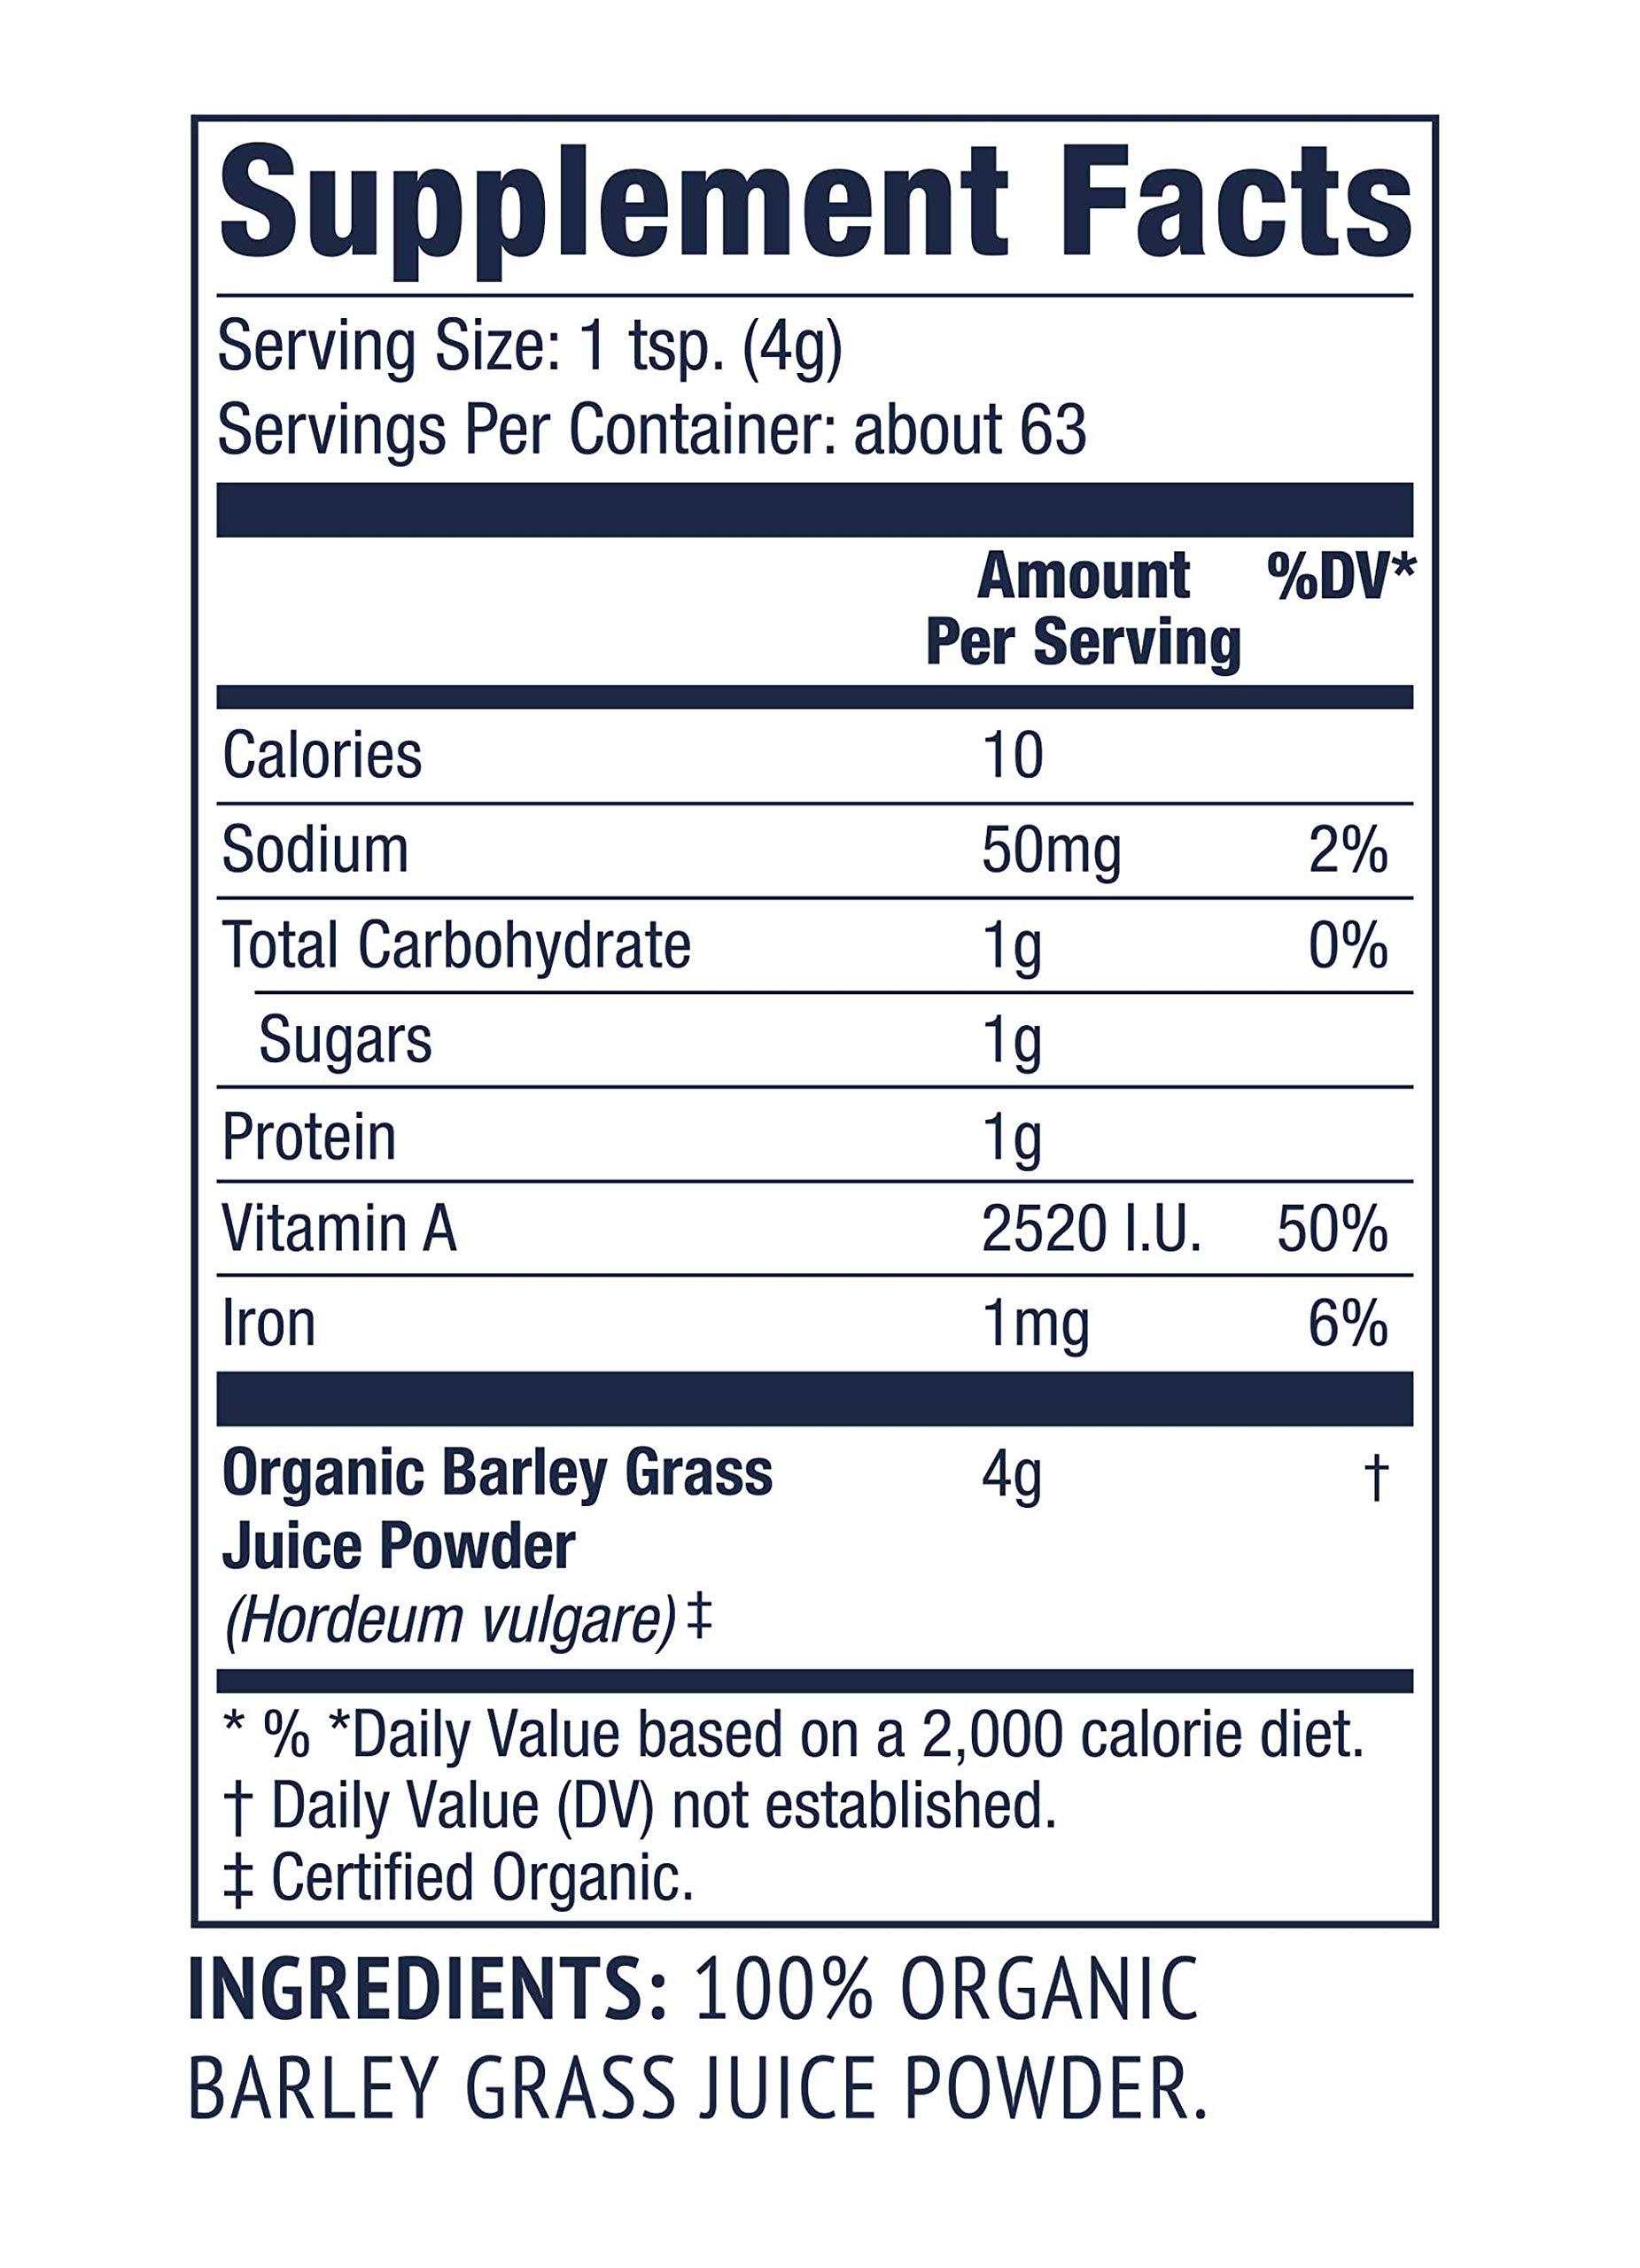 Vimergy USDA Organic Barleygrass Juice Powder (250g) X 2 Bags